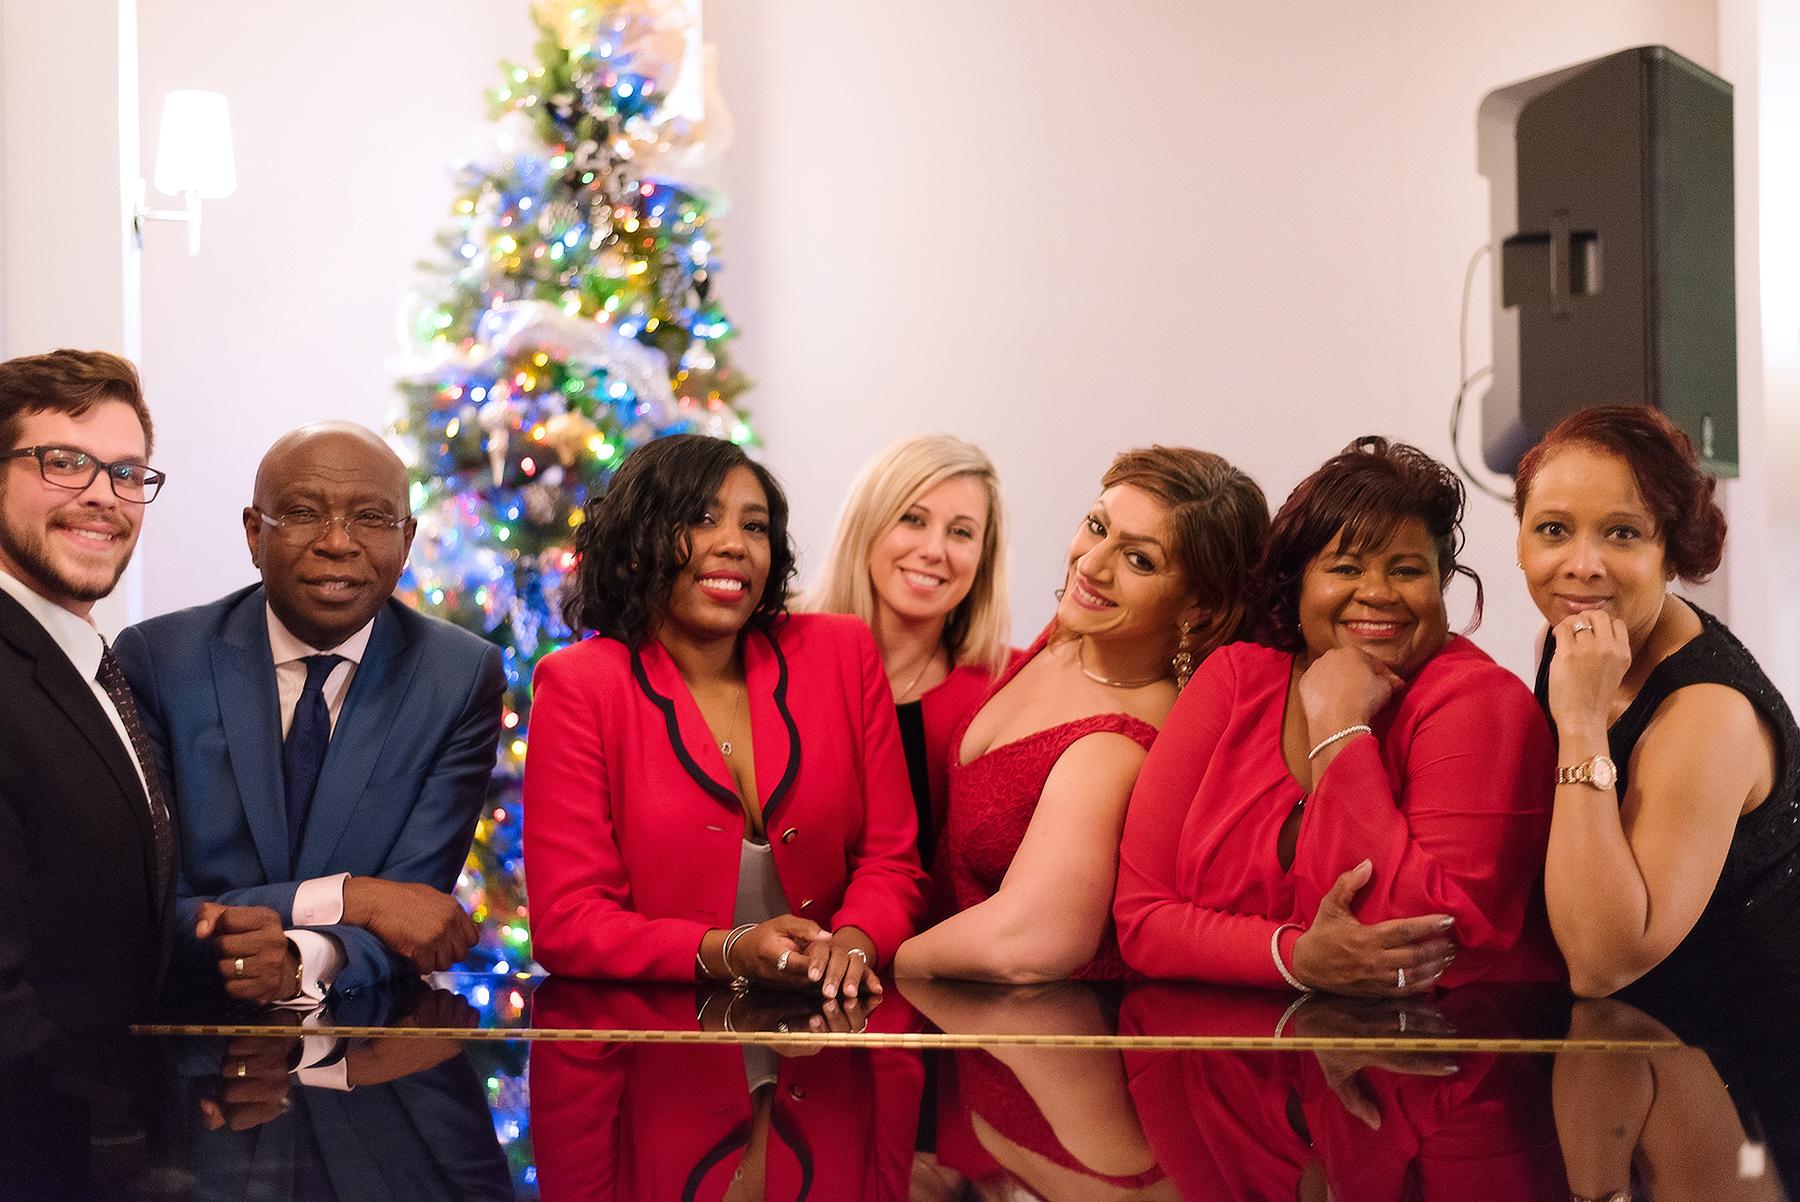 Signal Financial Holiday Party Corporate Washington D.C. Photography17.jpg